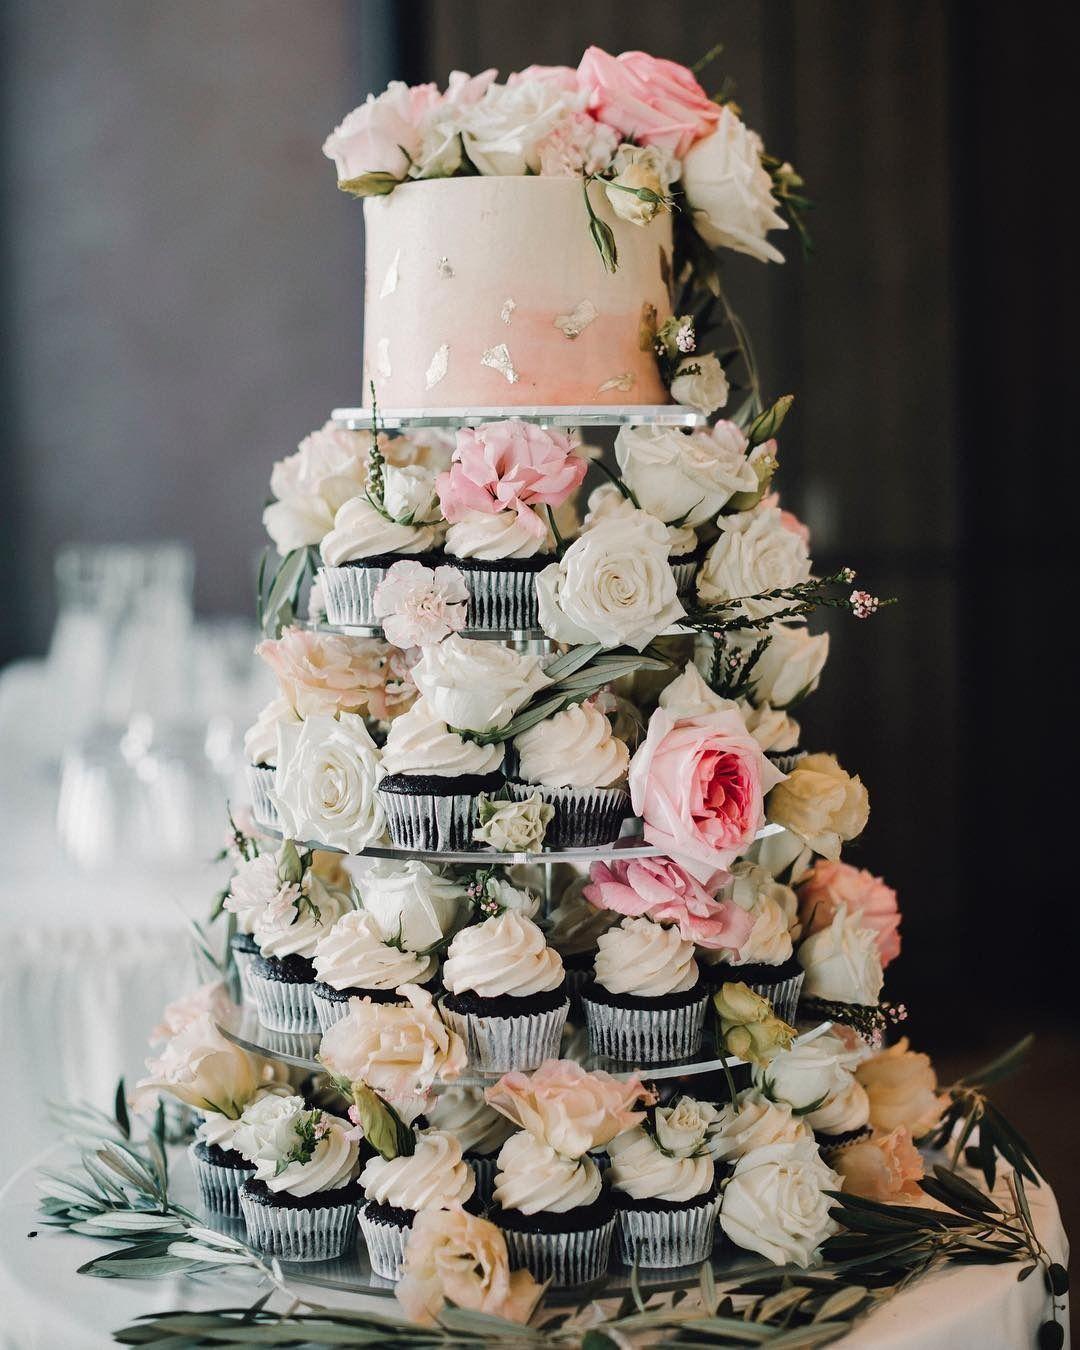 Alternative Wedding Cake Ideas David S Bridal Blog Wedding Cake Alternatives Wedding Cake Table Romantic Wedding Cake